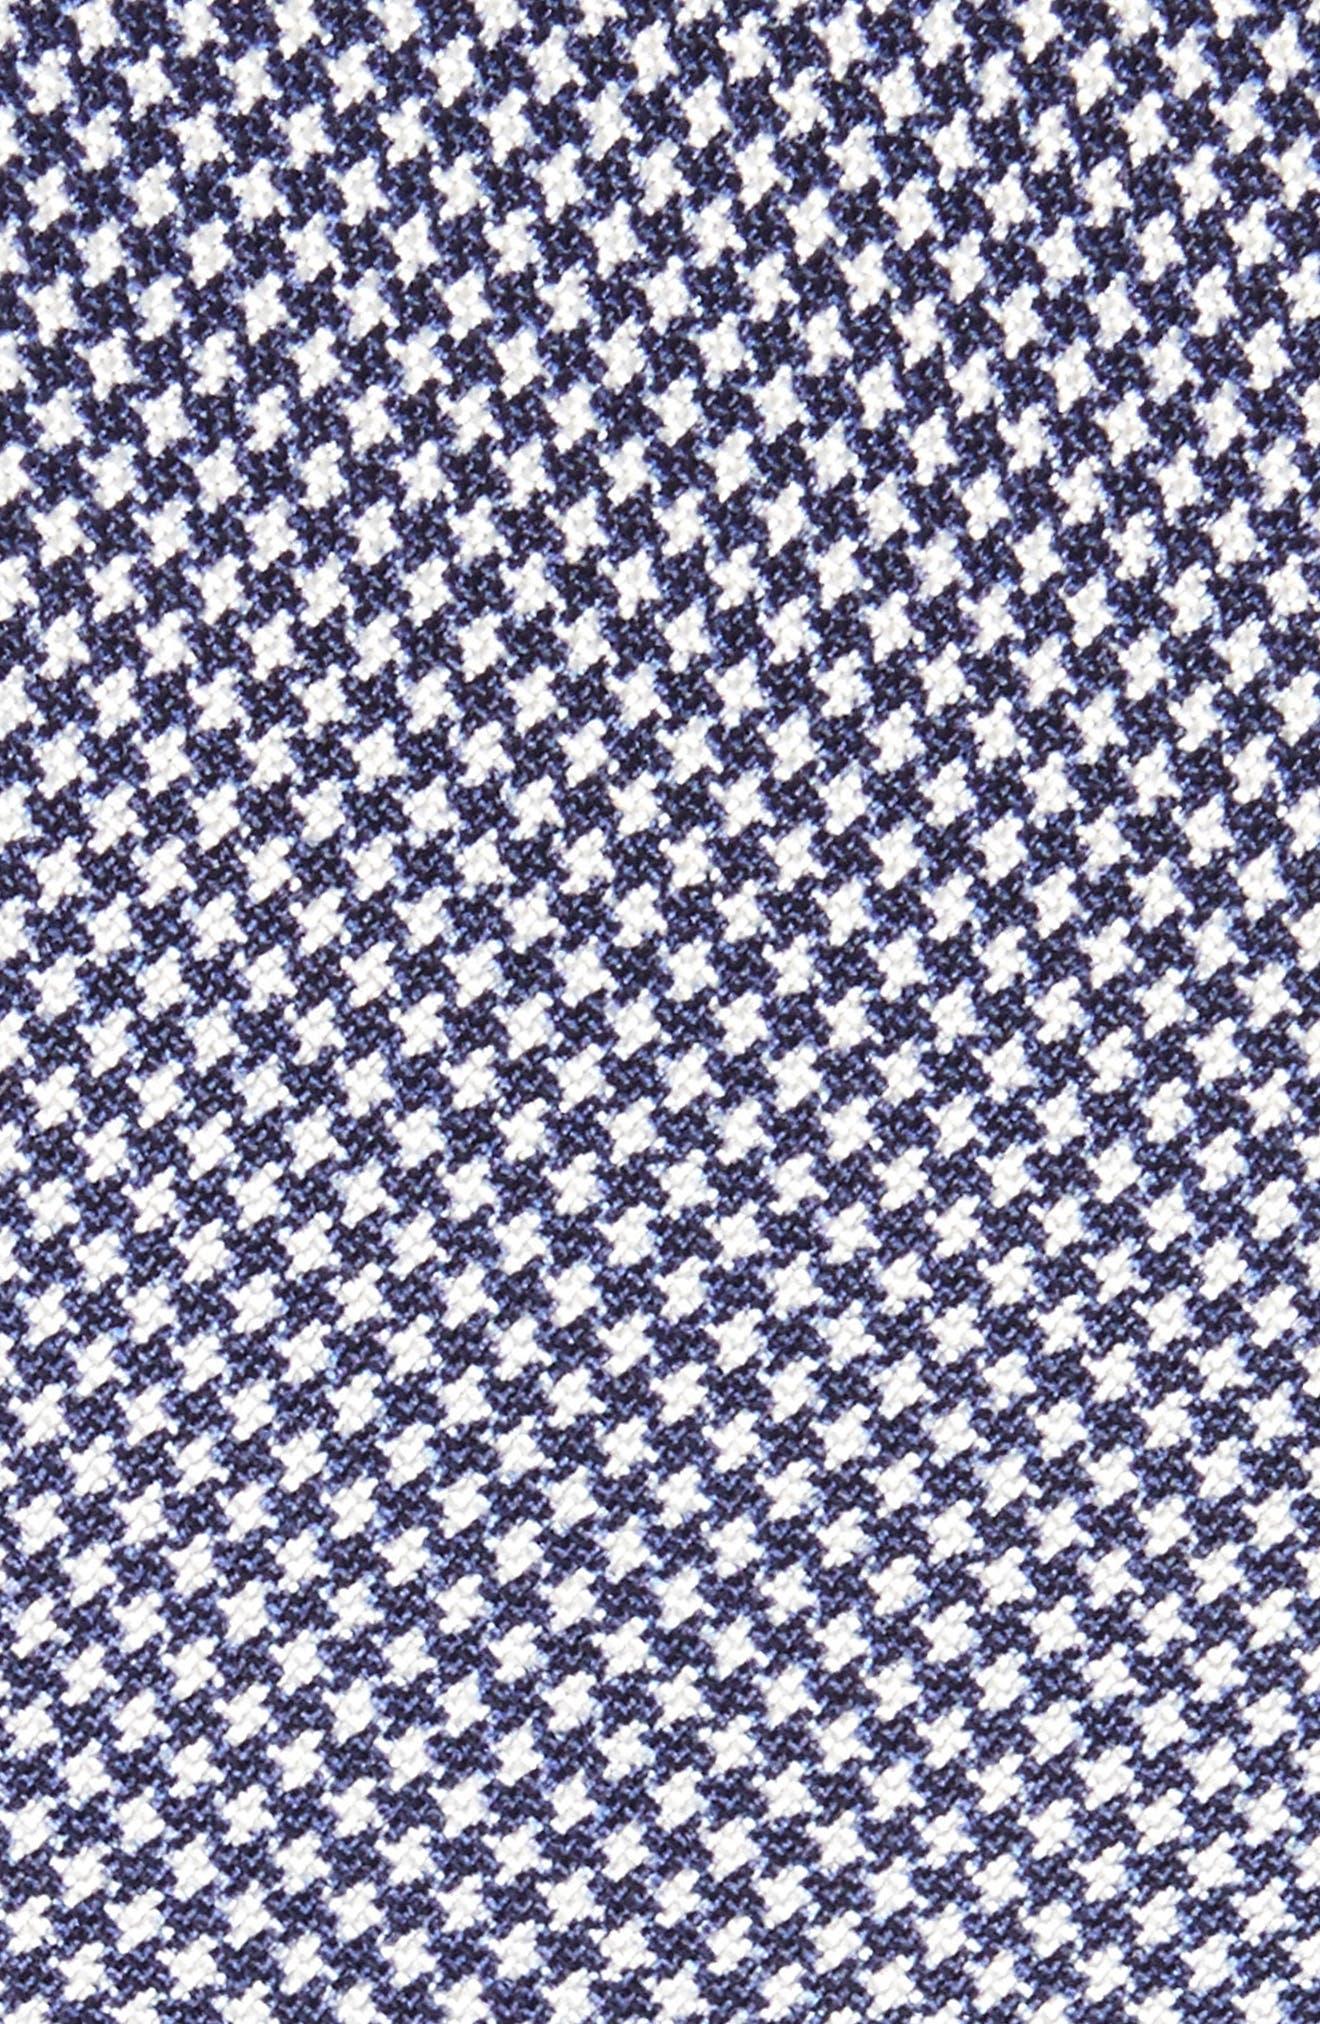 Houndstooth Silk Skinny Tie,                             Alternate thumbnail 2, color,                             NAVY